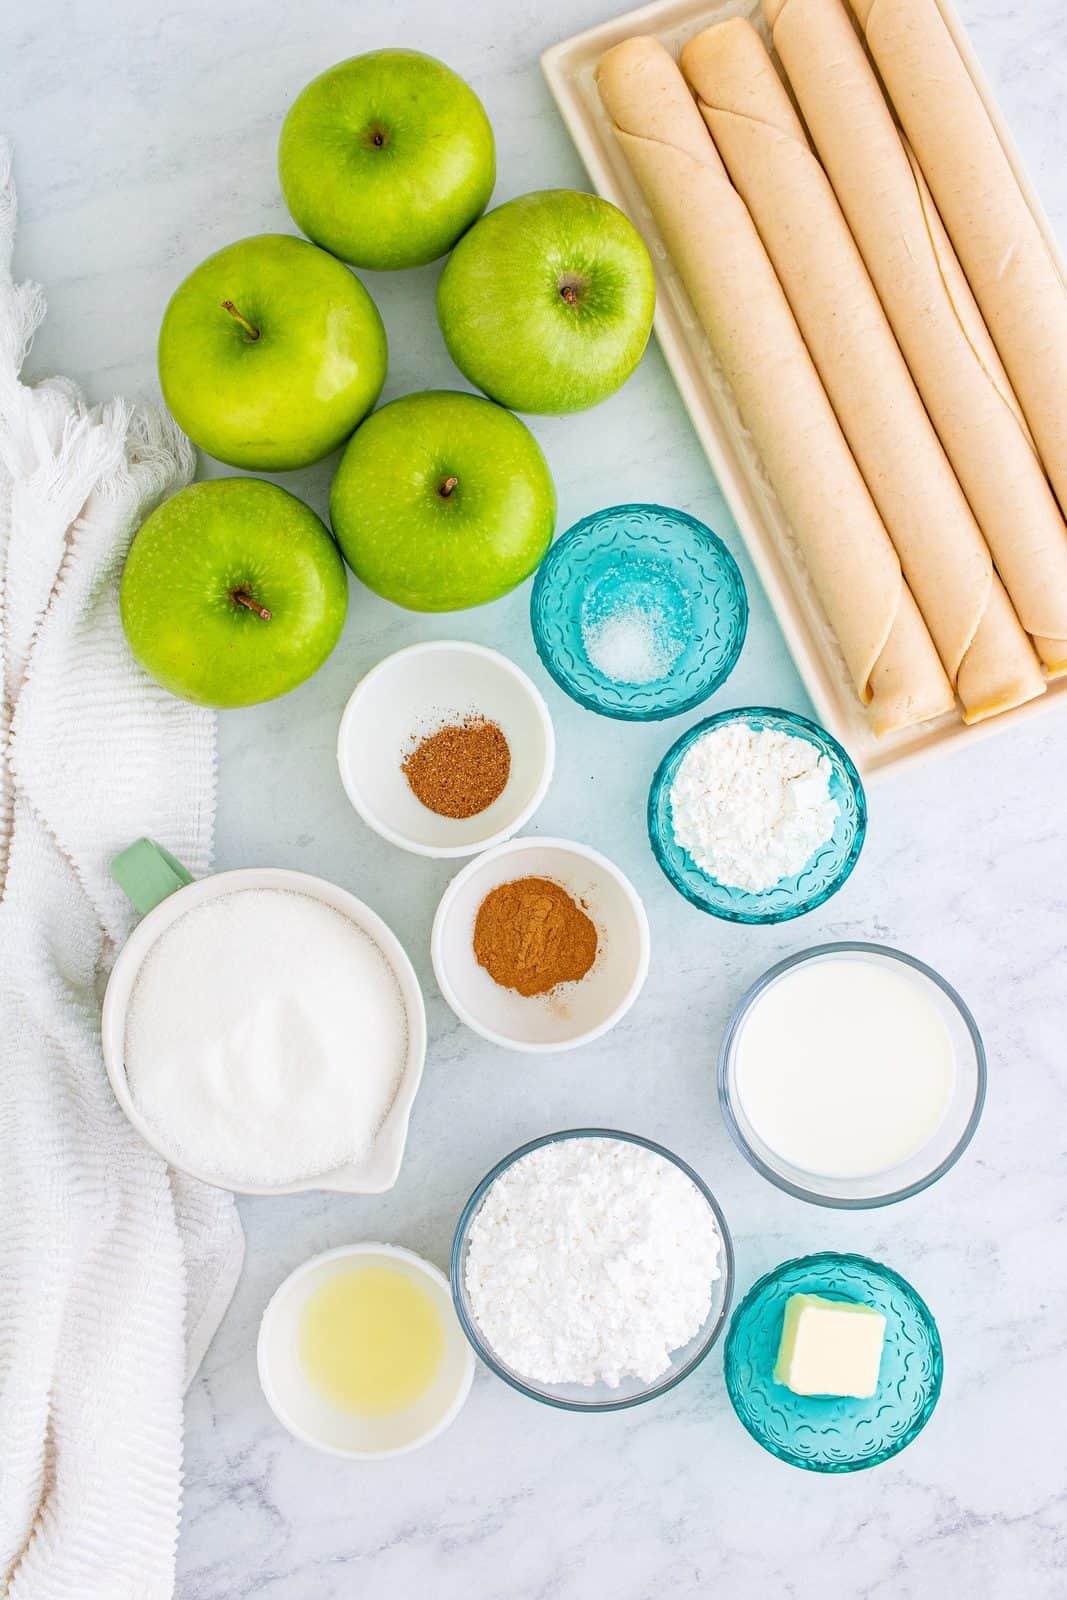 Ingredients needed: refrigerator pie crusts, apples, granulated sugar, cornstarch, lemon juice, ground cinnamon, ground nutmeg, salt, whole milk, unsalted butter and powdered sugar.